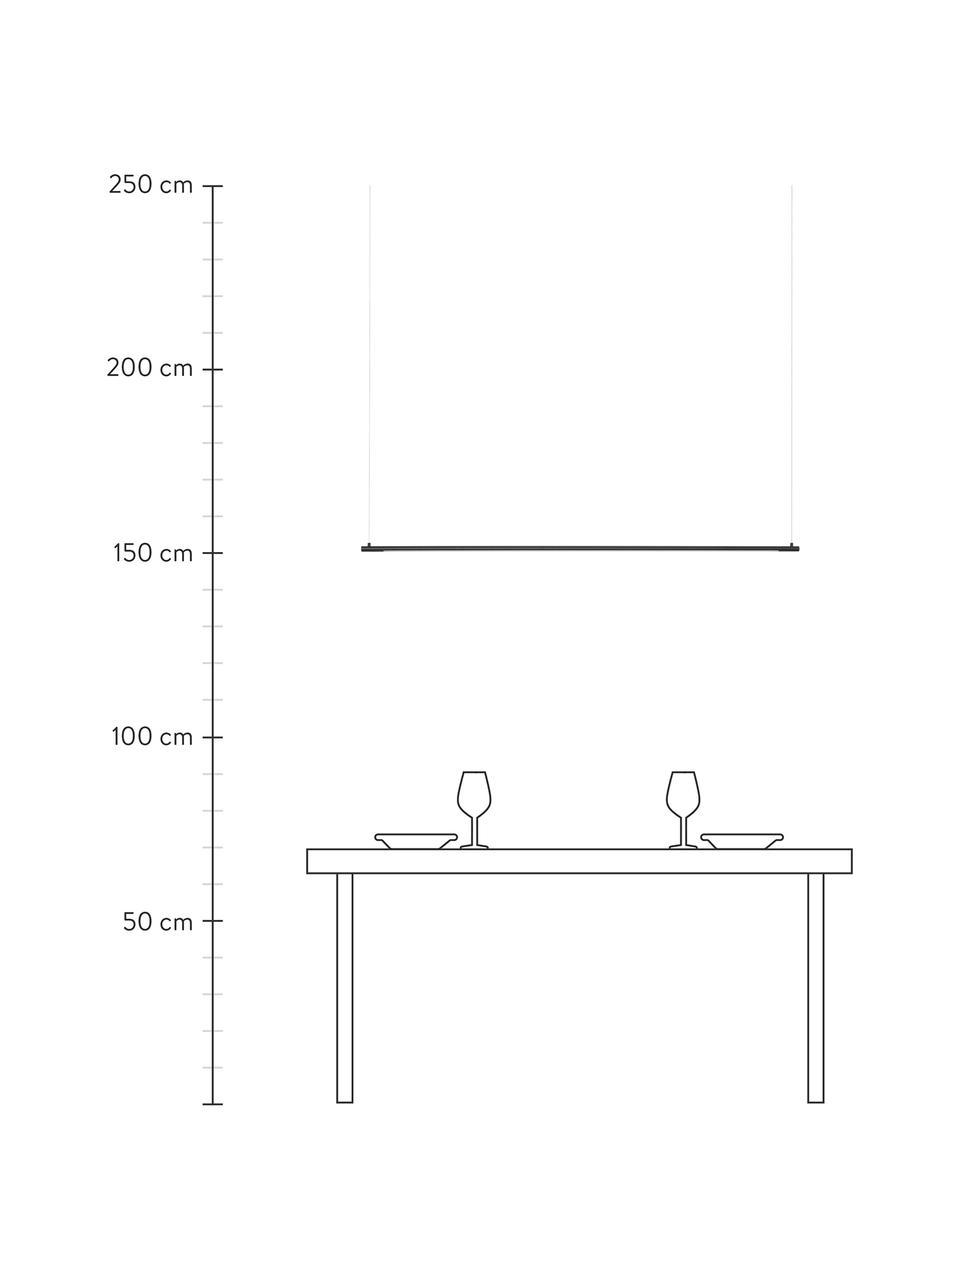 Große LED-Pendelleuchte Elettra, Lampenschirm: Aluminium, Baldachin: Aluminium, Schwarz, 120 x 2 cm